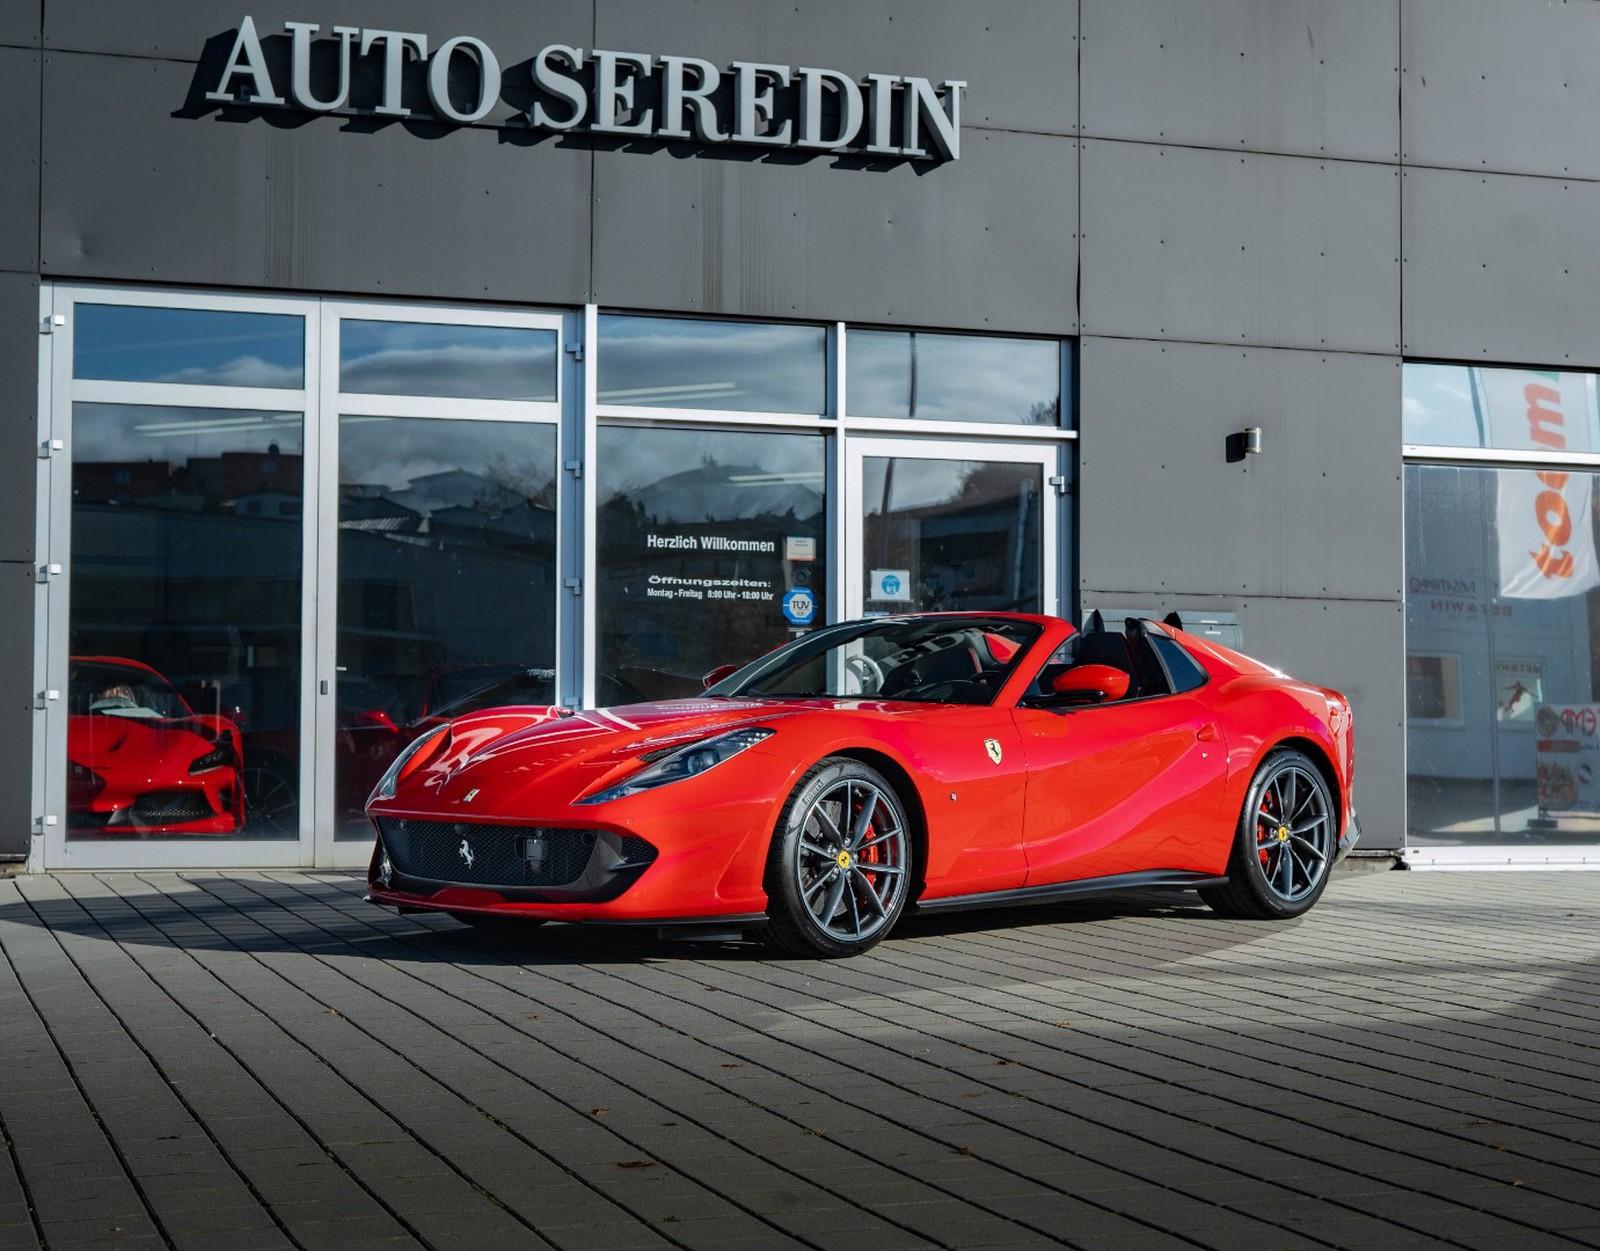 Ferrari 812 Gts New Buy In Hechingen Bei Stuttgart Price 481950 Eur Int Nr 20 500 Sold